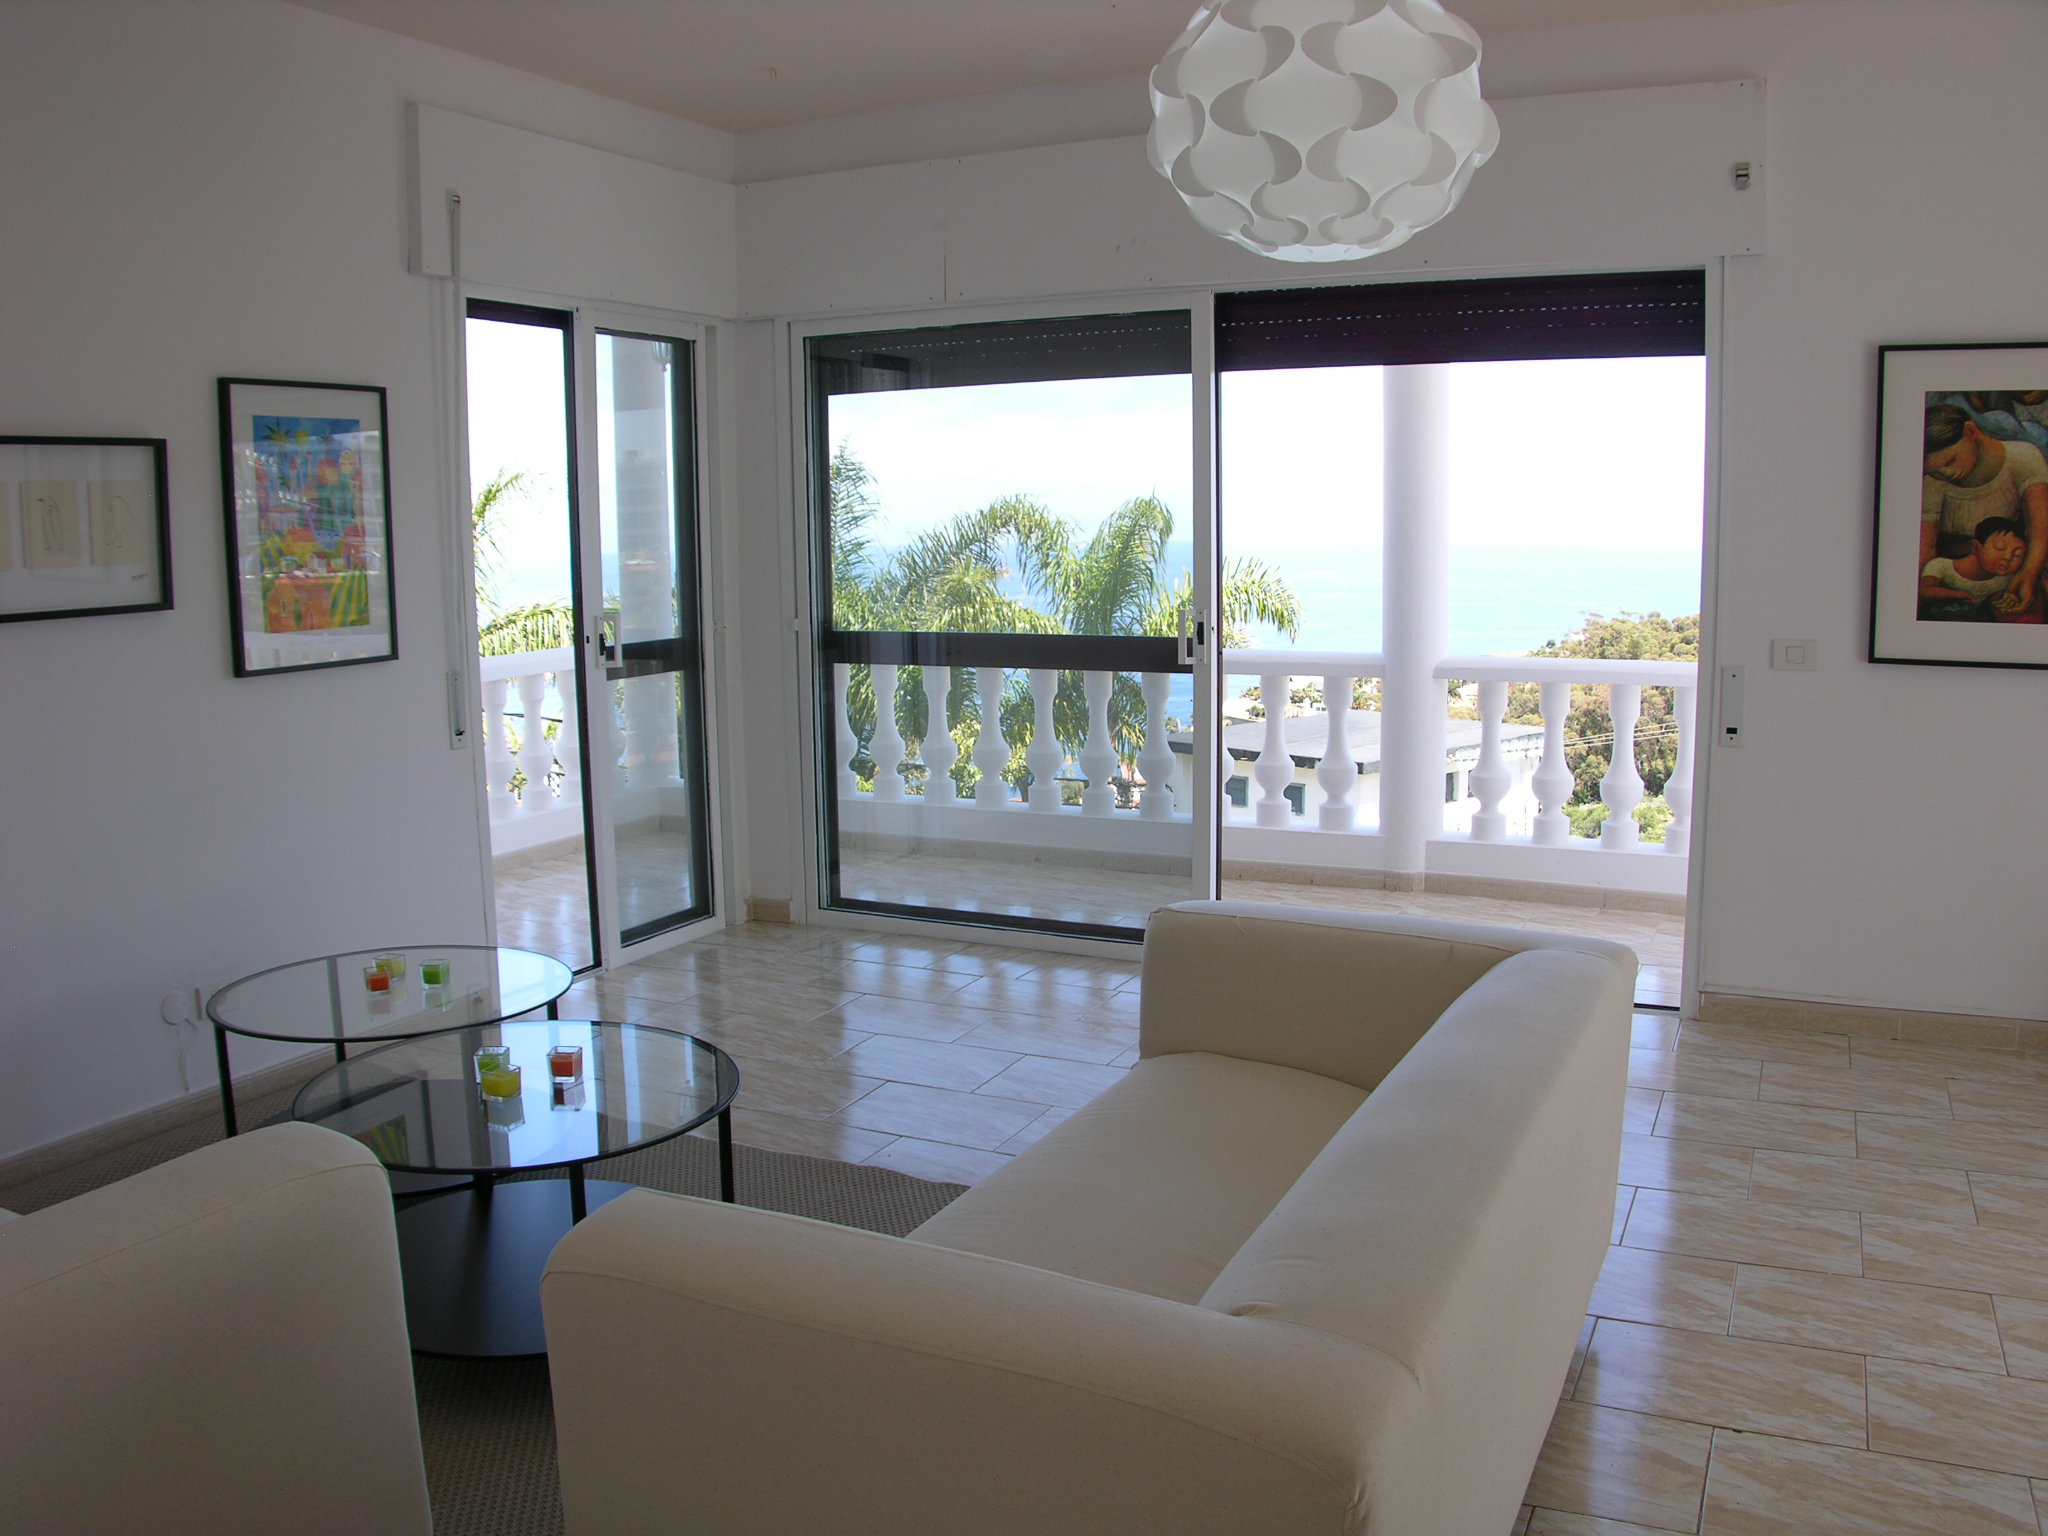 Maison de vacances Villa Vista La Quinta beheizbarer Pool kostenloses WLAN Grill (2124407), Santa Ursula, Ténérife, Iles Canaries, Espagne, image 52